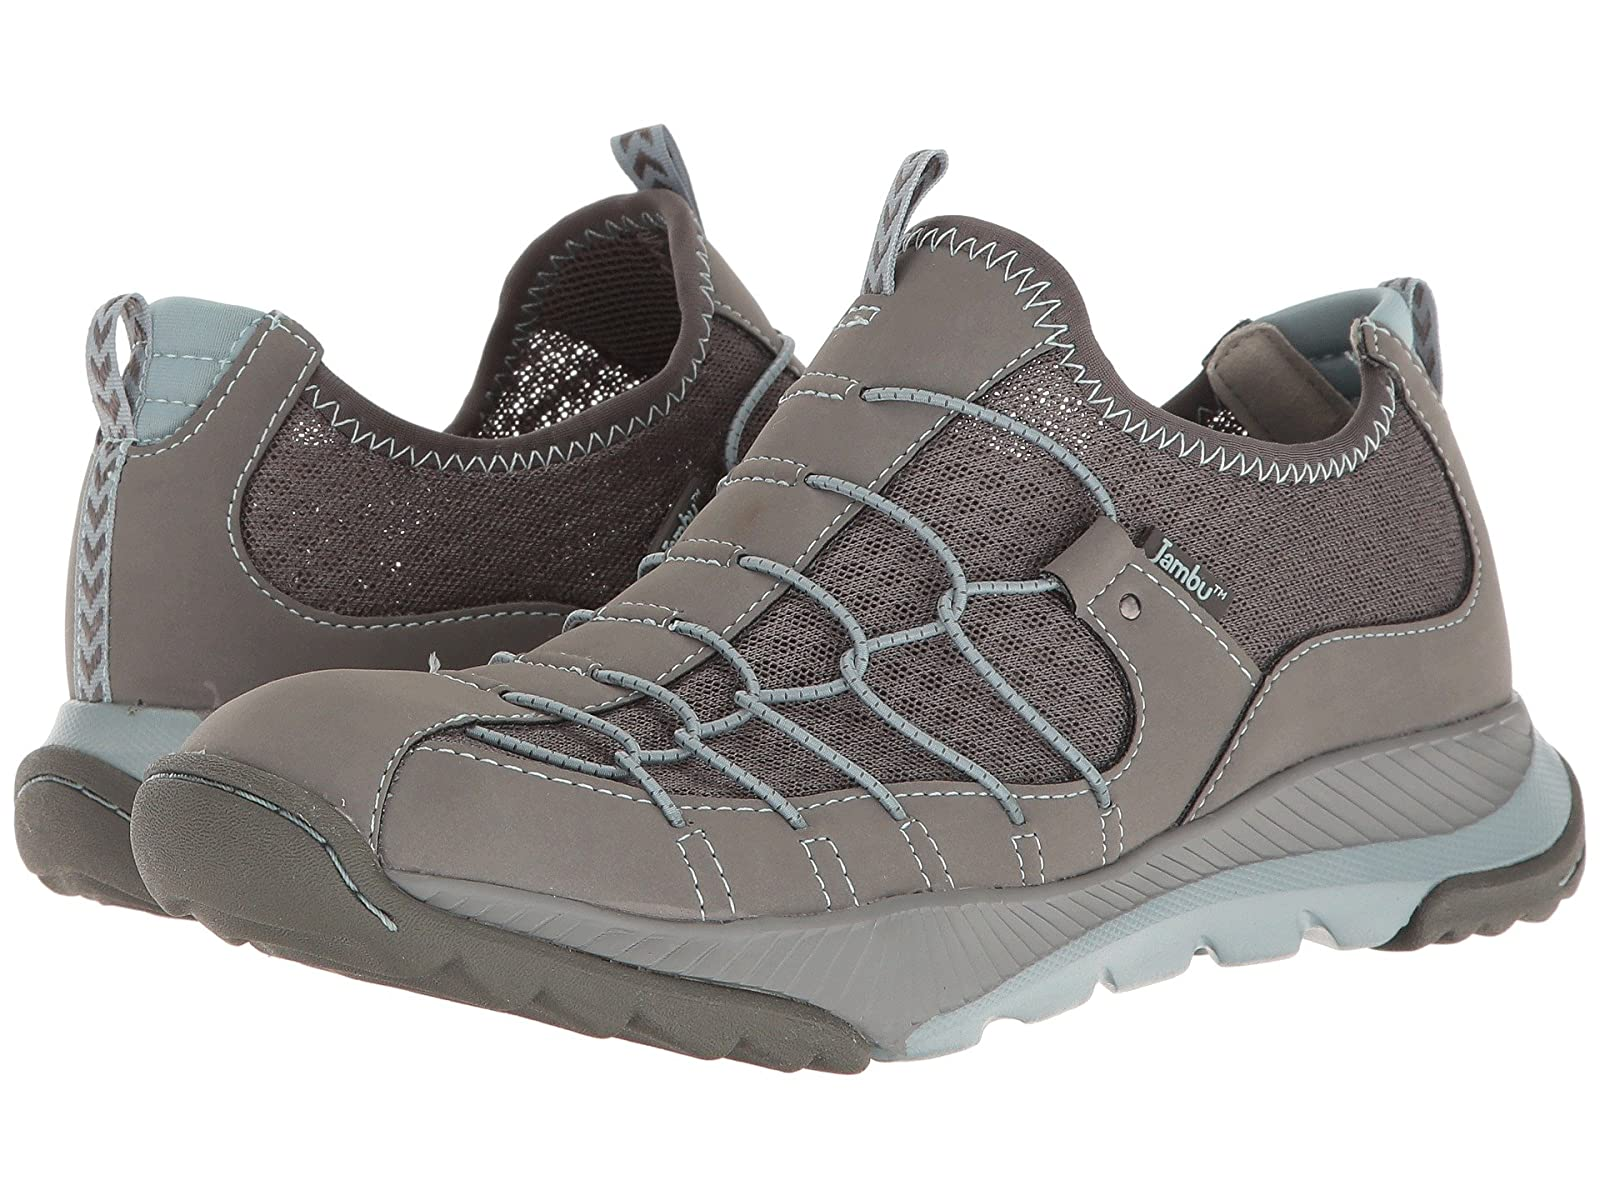 Jambu Sparrow-Vegan Water ReadyCheap and distinctive eye-catching shoes